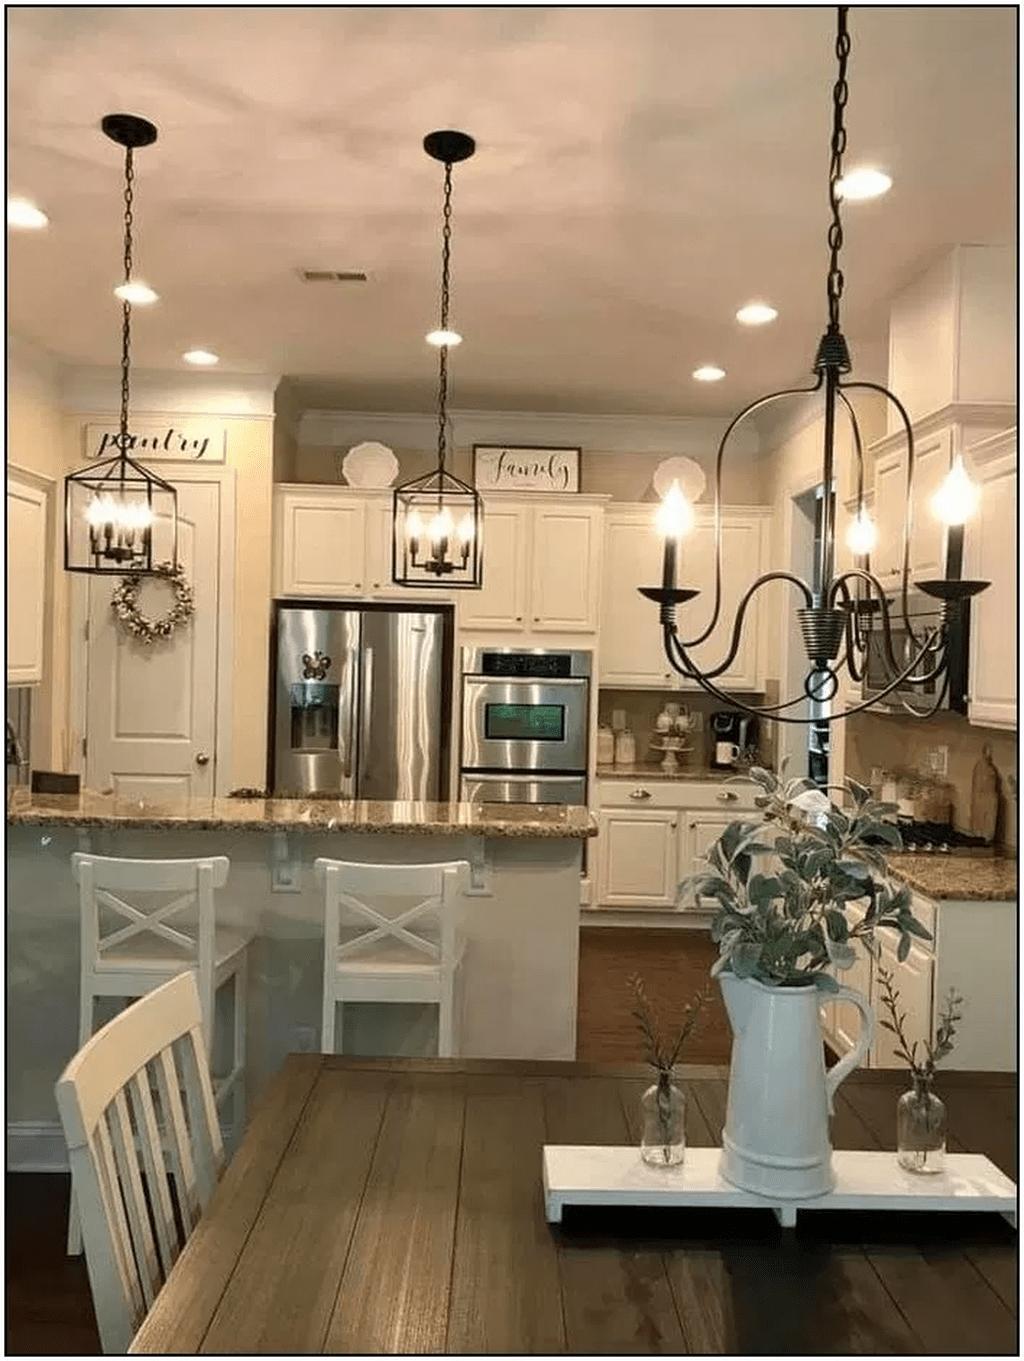 32 Stunning Dining Room Lighting Ideas In 2020 Farmhouse Dining Rooms Decor Farmhouse Kitchen Design Farmhouse Kitchen Lighting